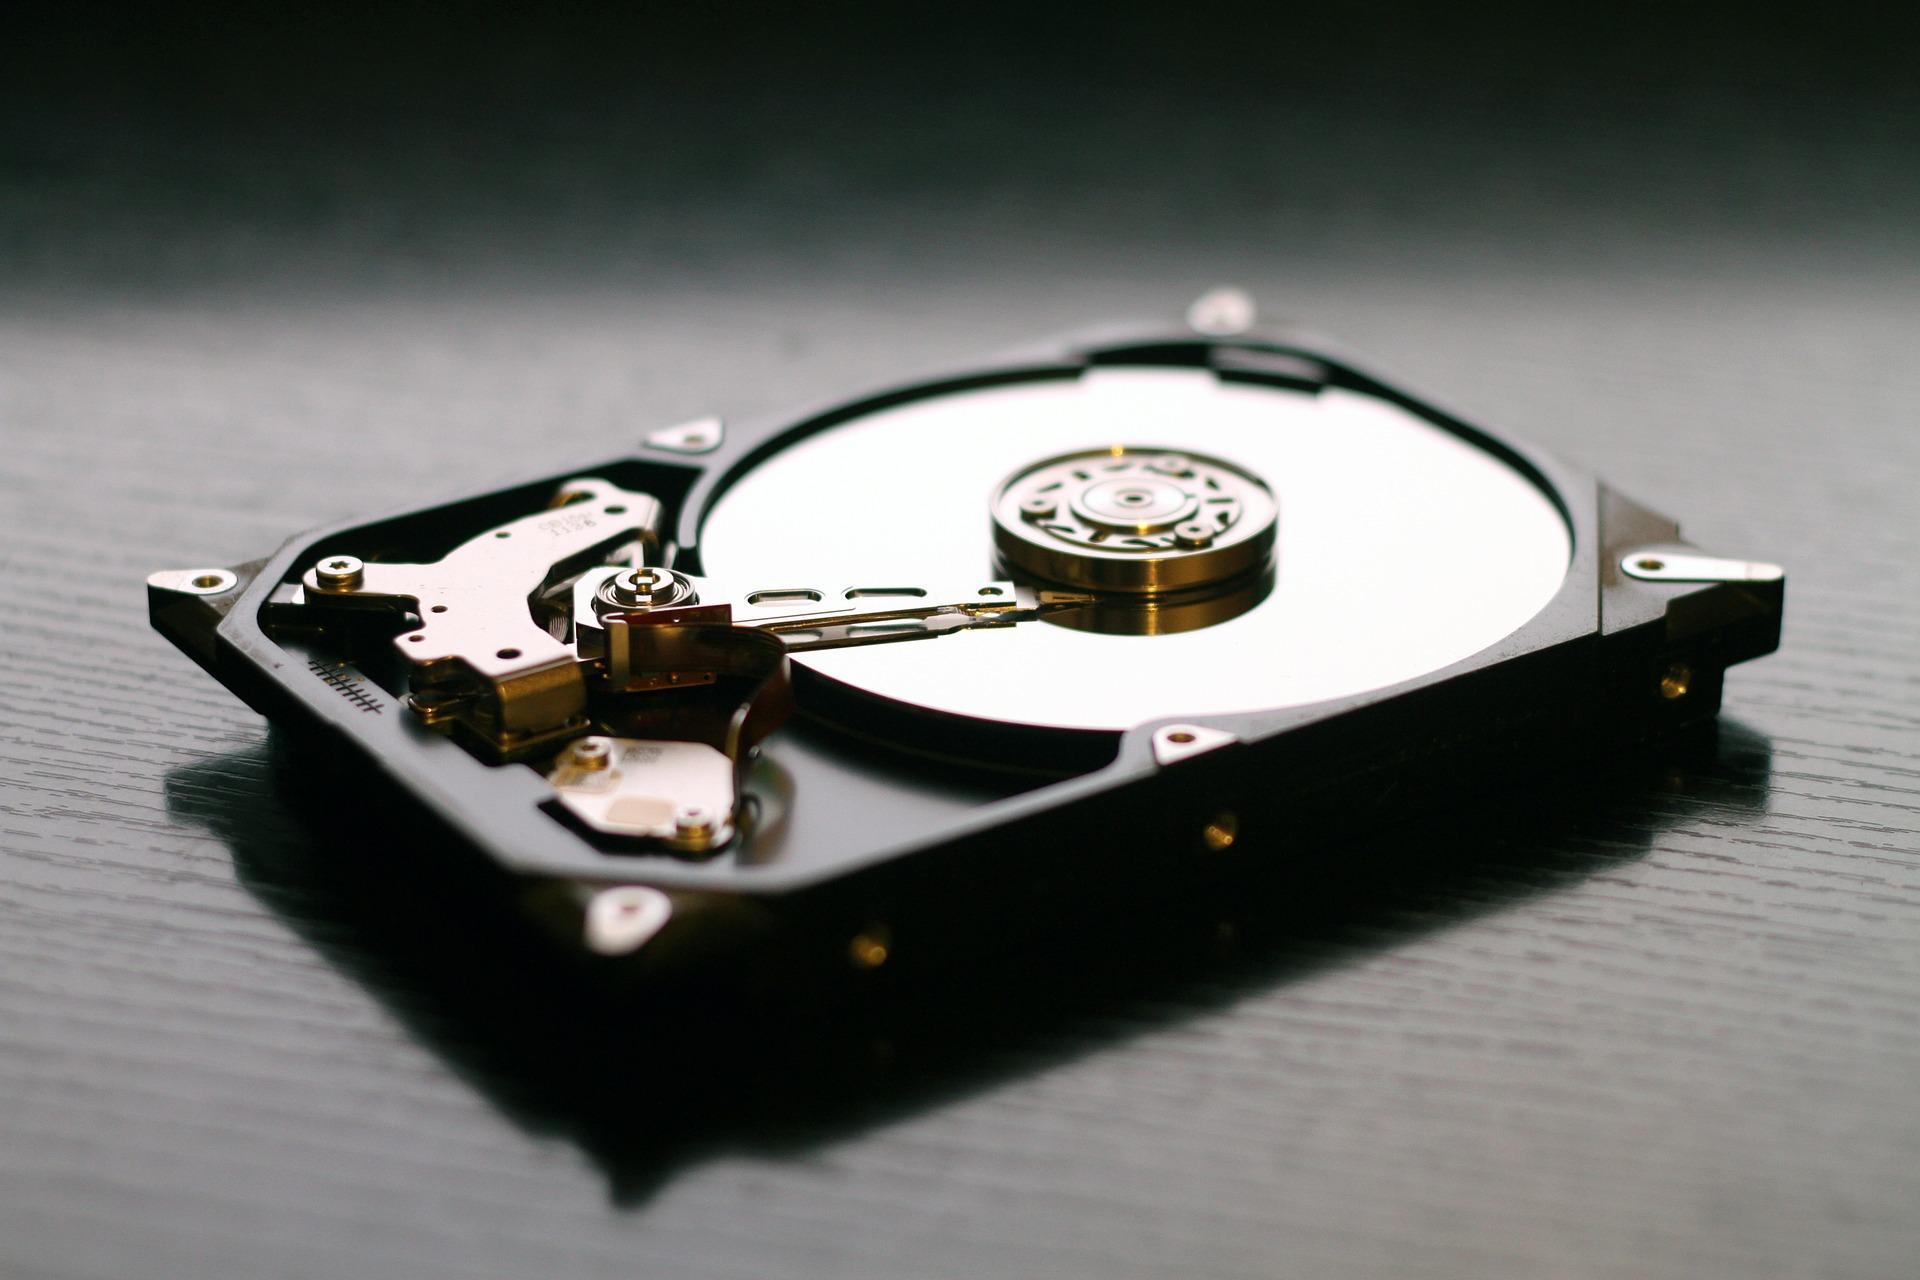 Medium Hosting Plan - Full Service Hosting Image